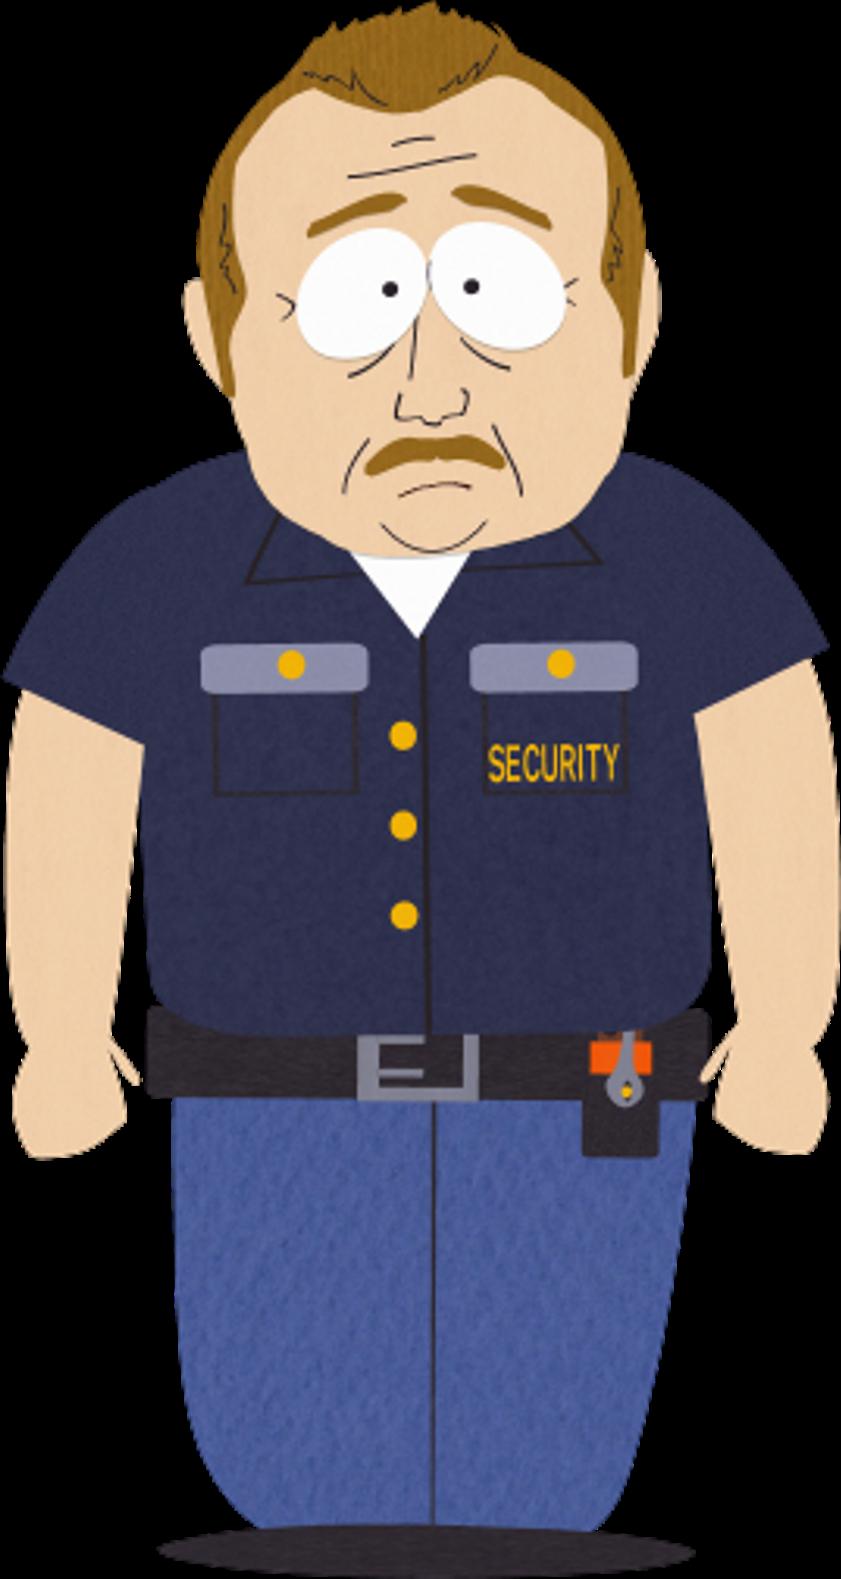 svg free library Security south park archives. Guard clipart uniform shirt